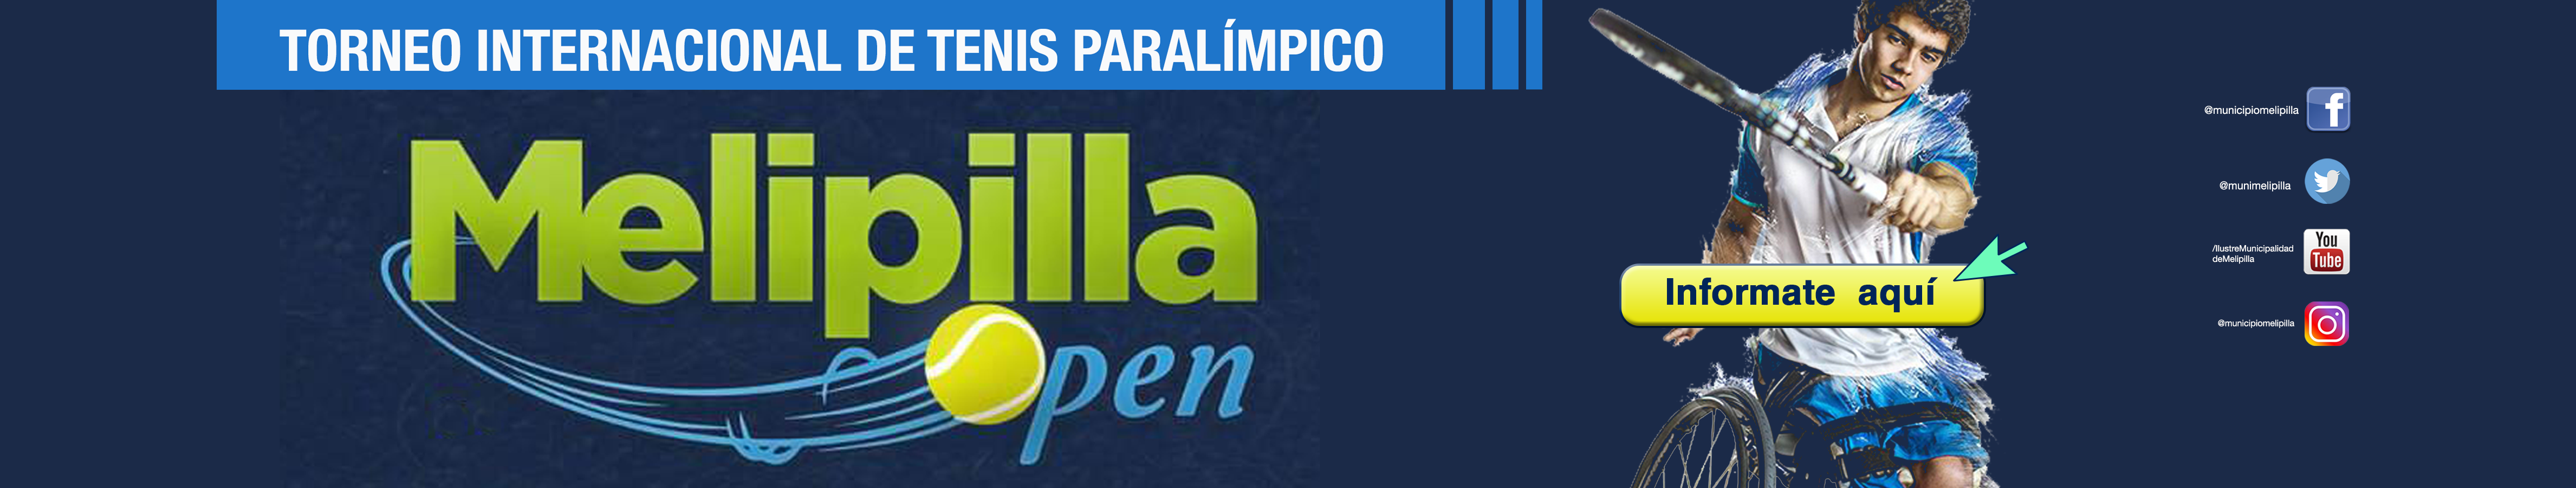 slider-open-melipilla